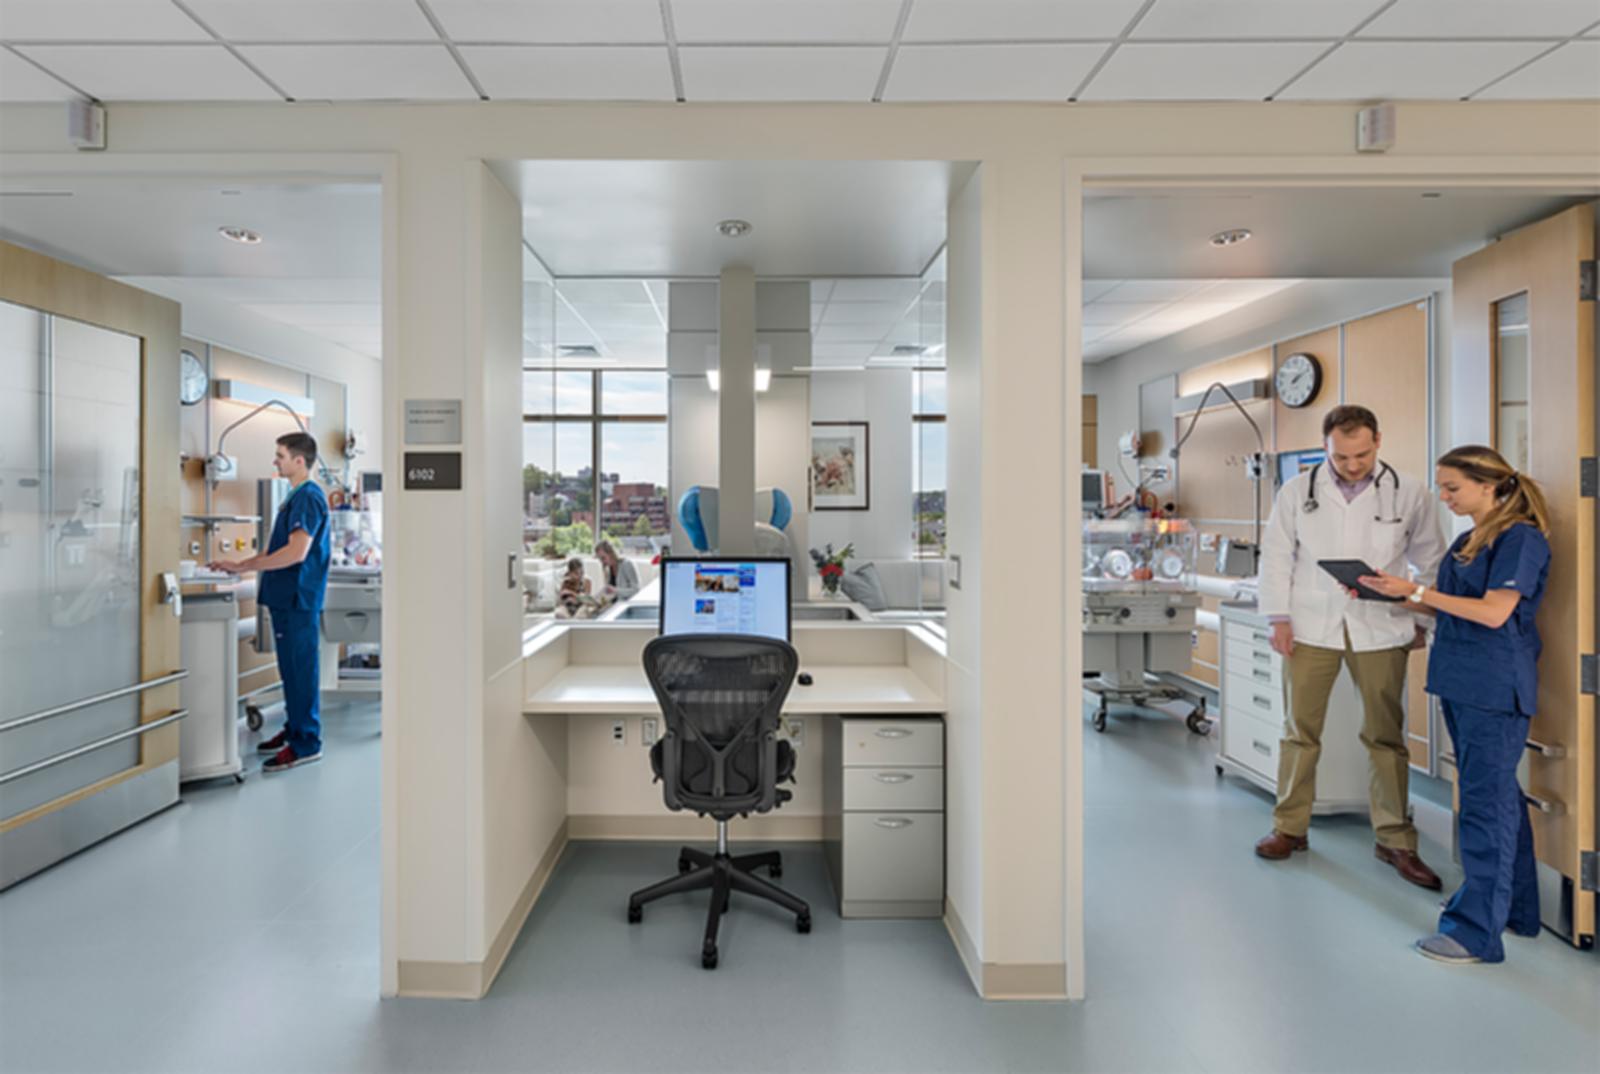 Boston Hospital NICU